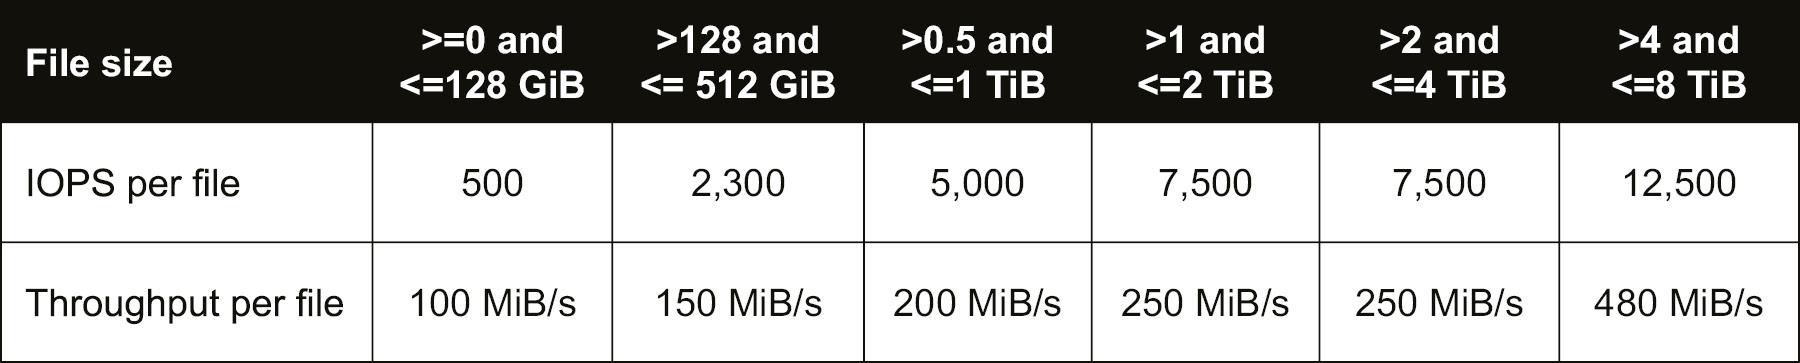 File I/O characteristics for Premium storage